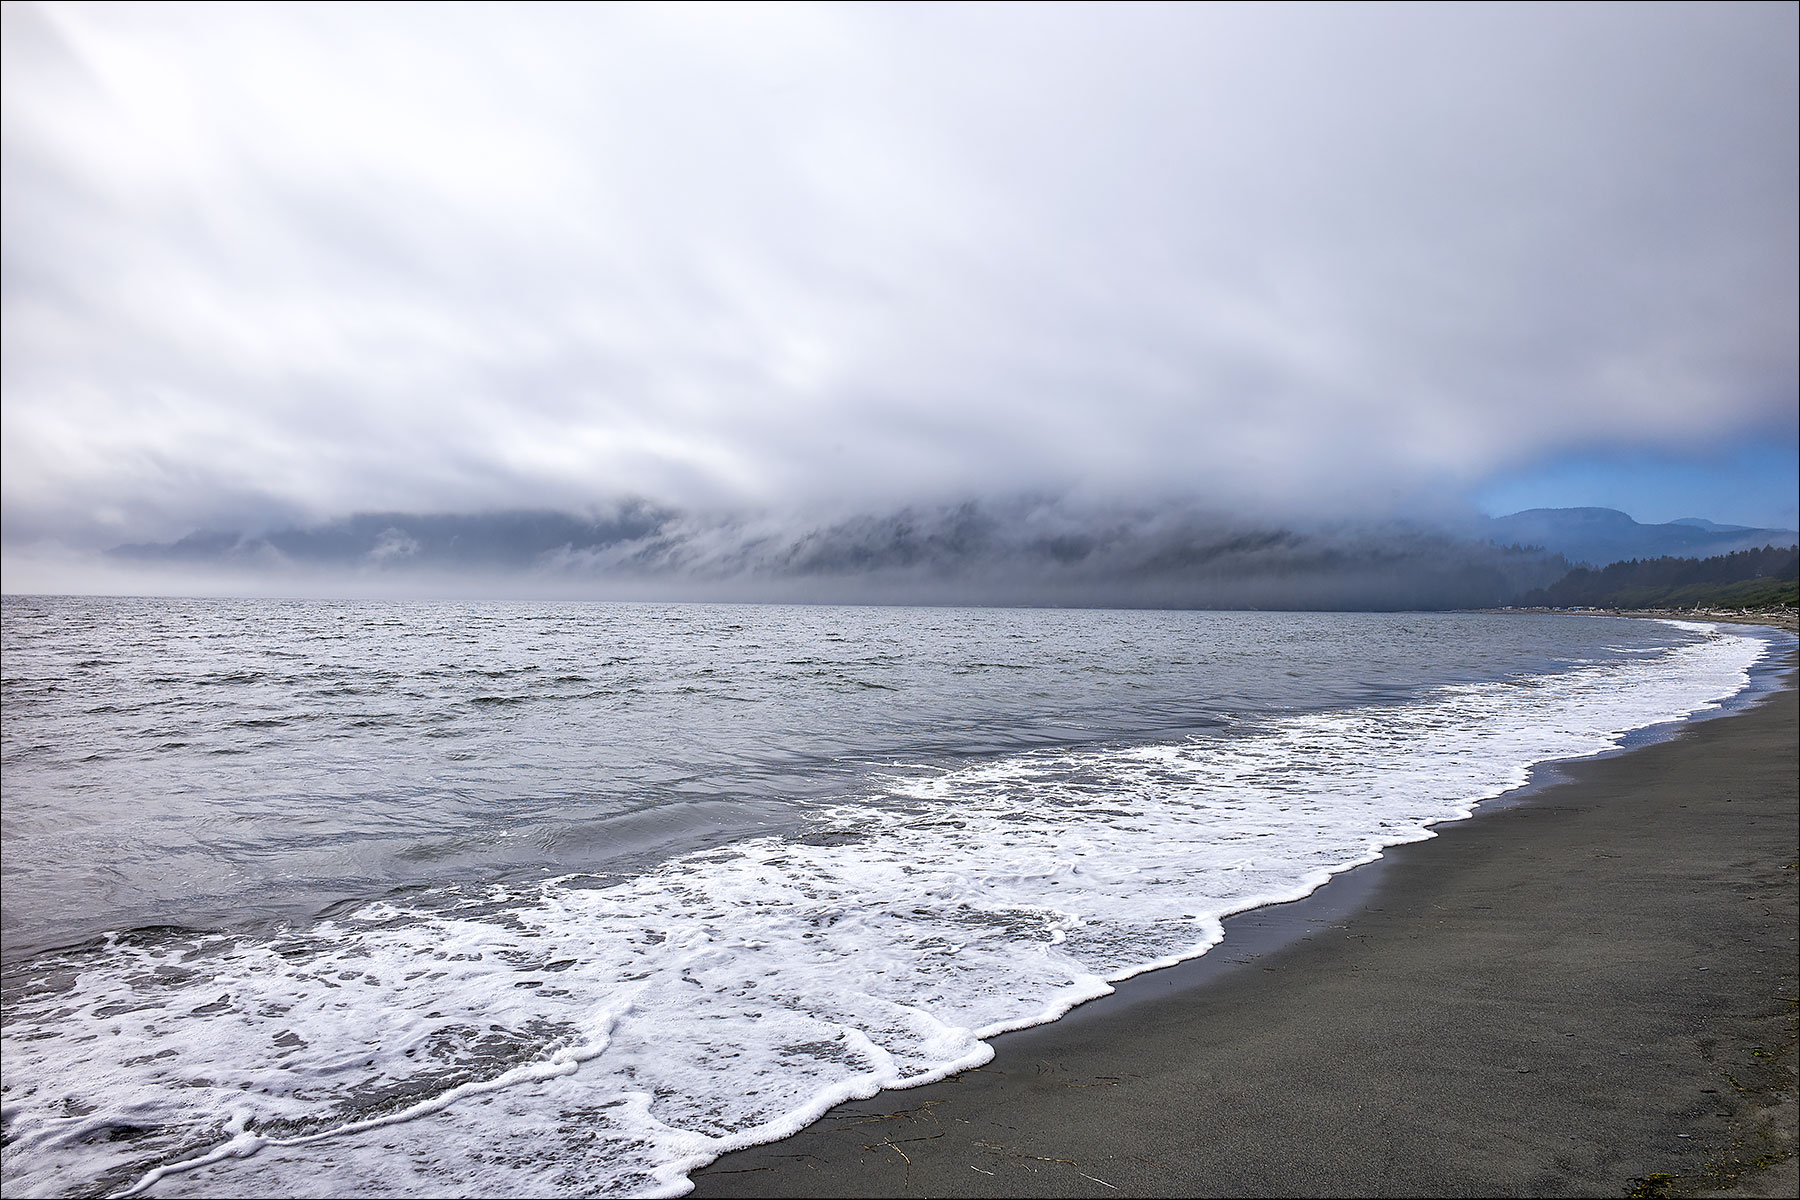 Pacific Rim National Park at Port Renfrew ©johncameron.ca